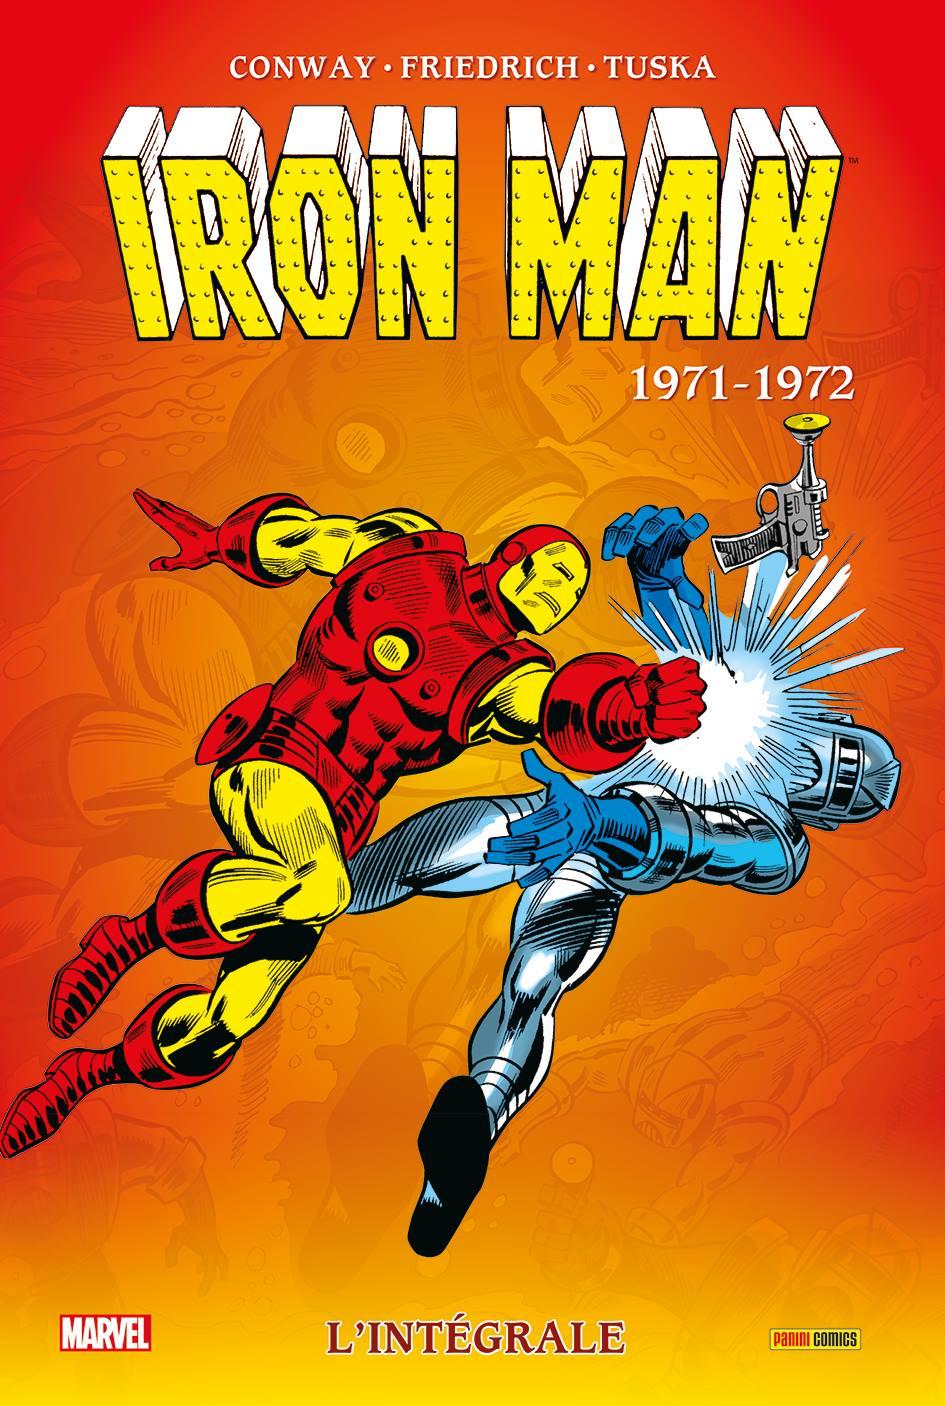 Iron Man l'Intégrale 1971-1972